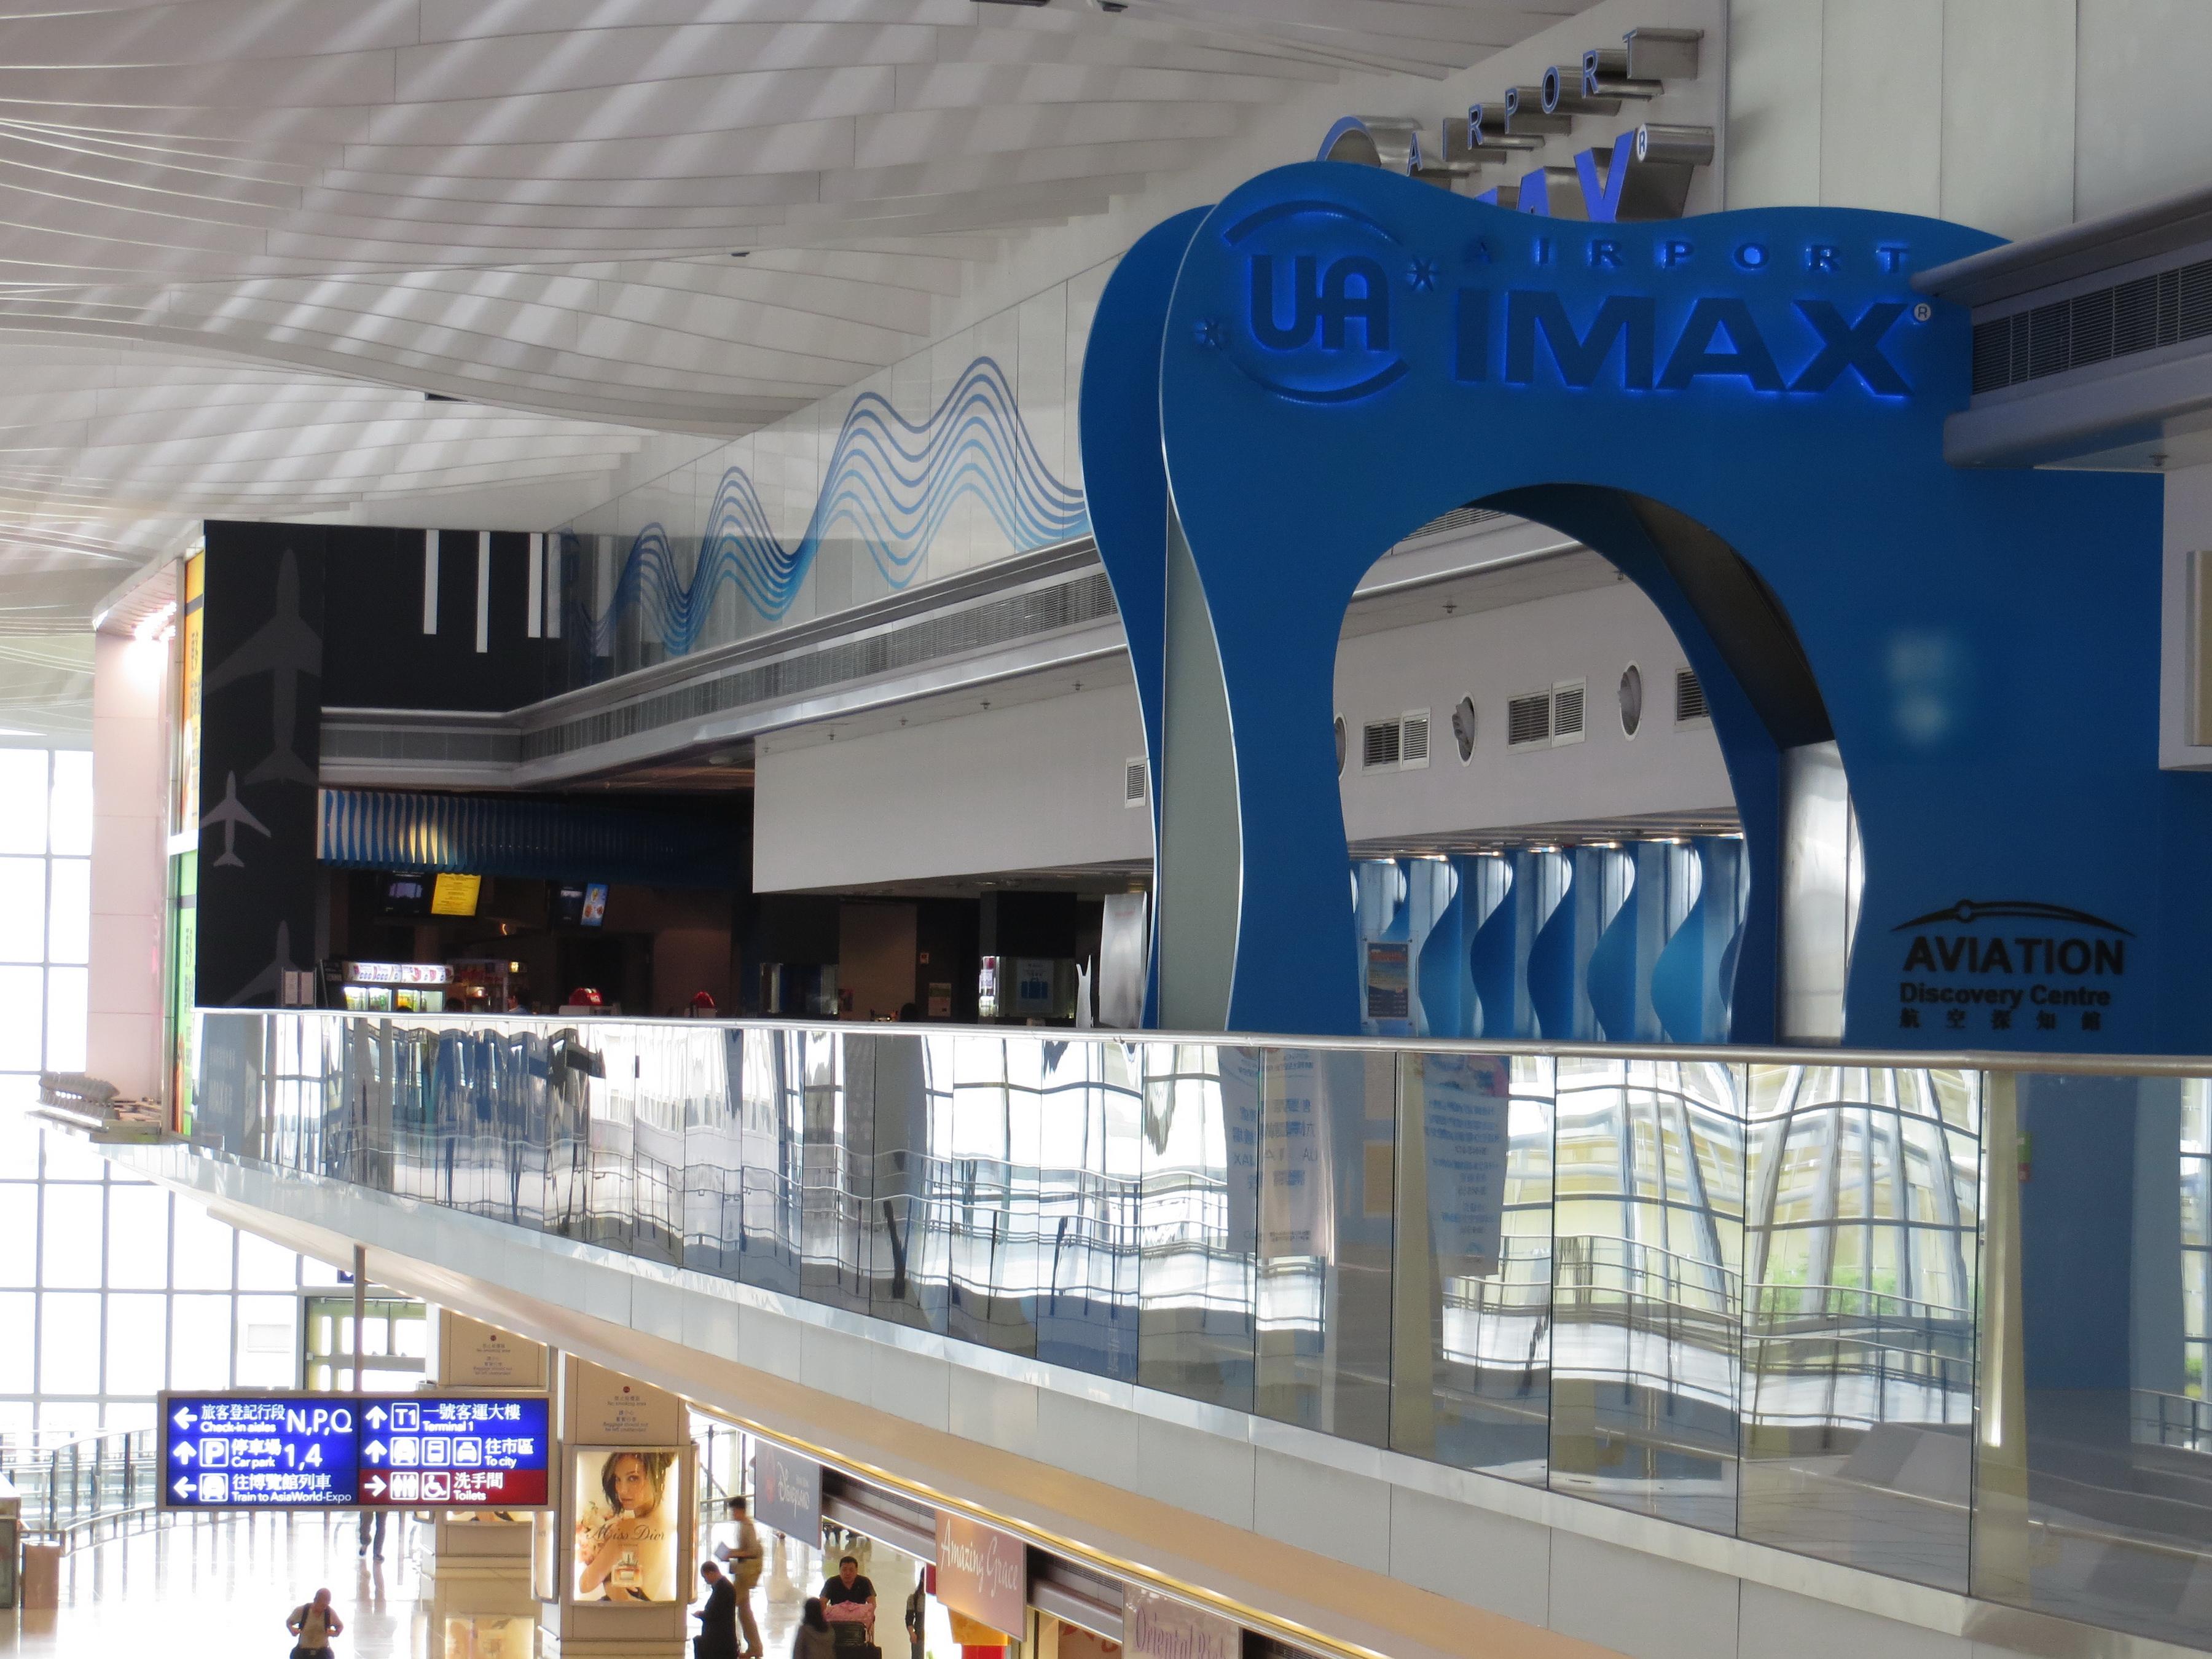 ??UA IMAX